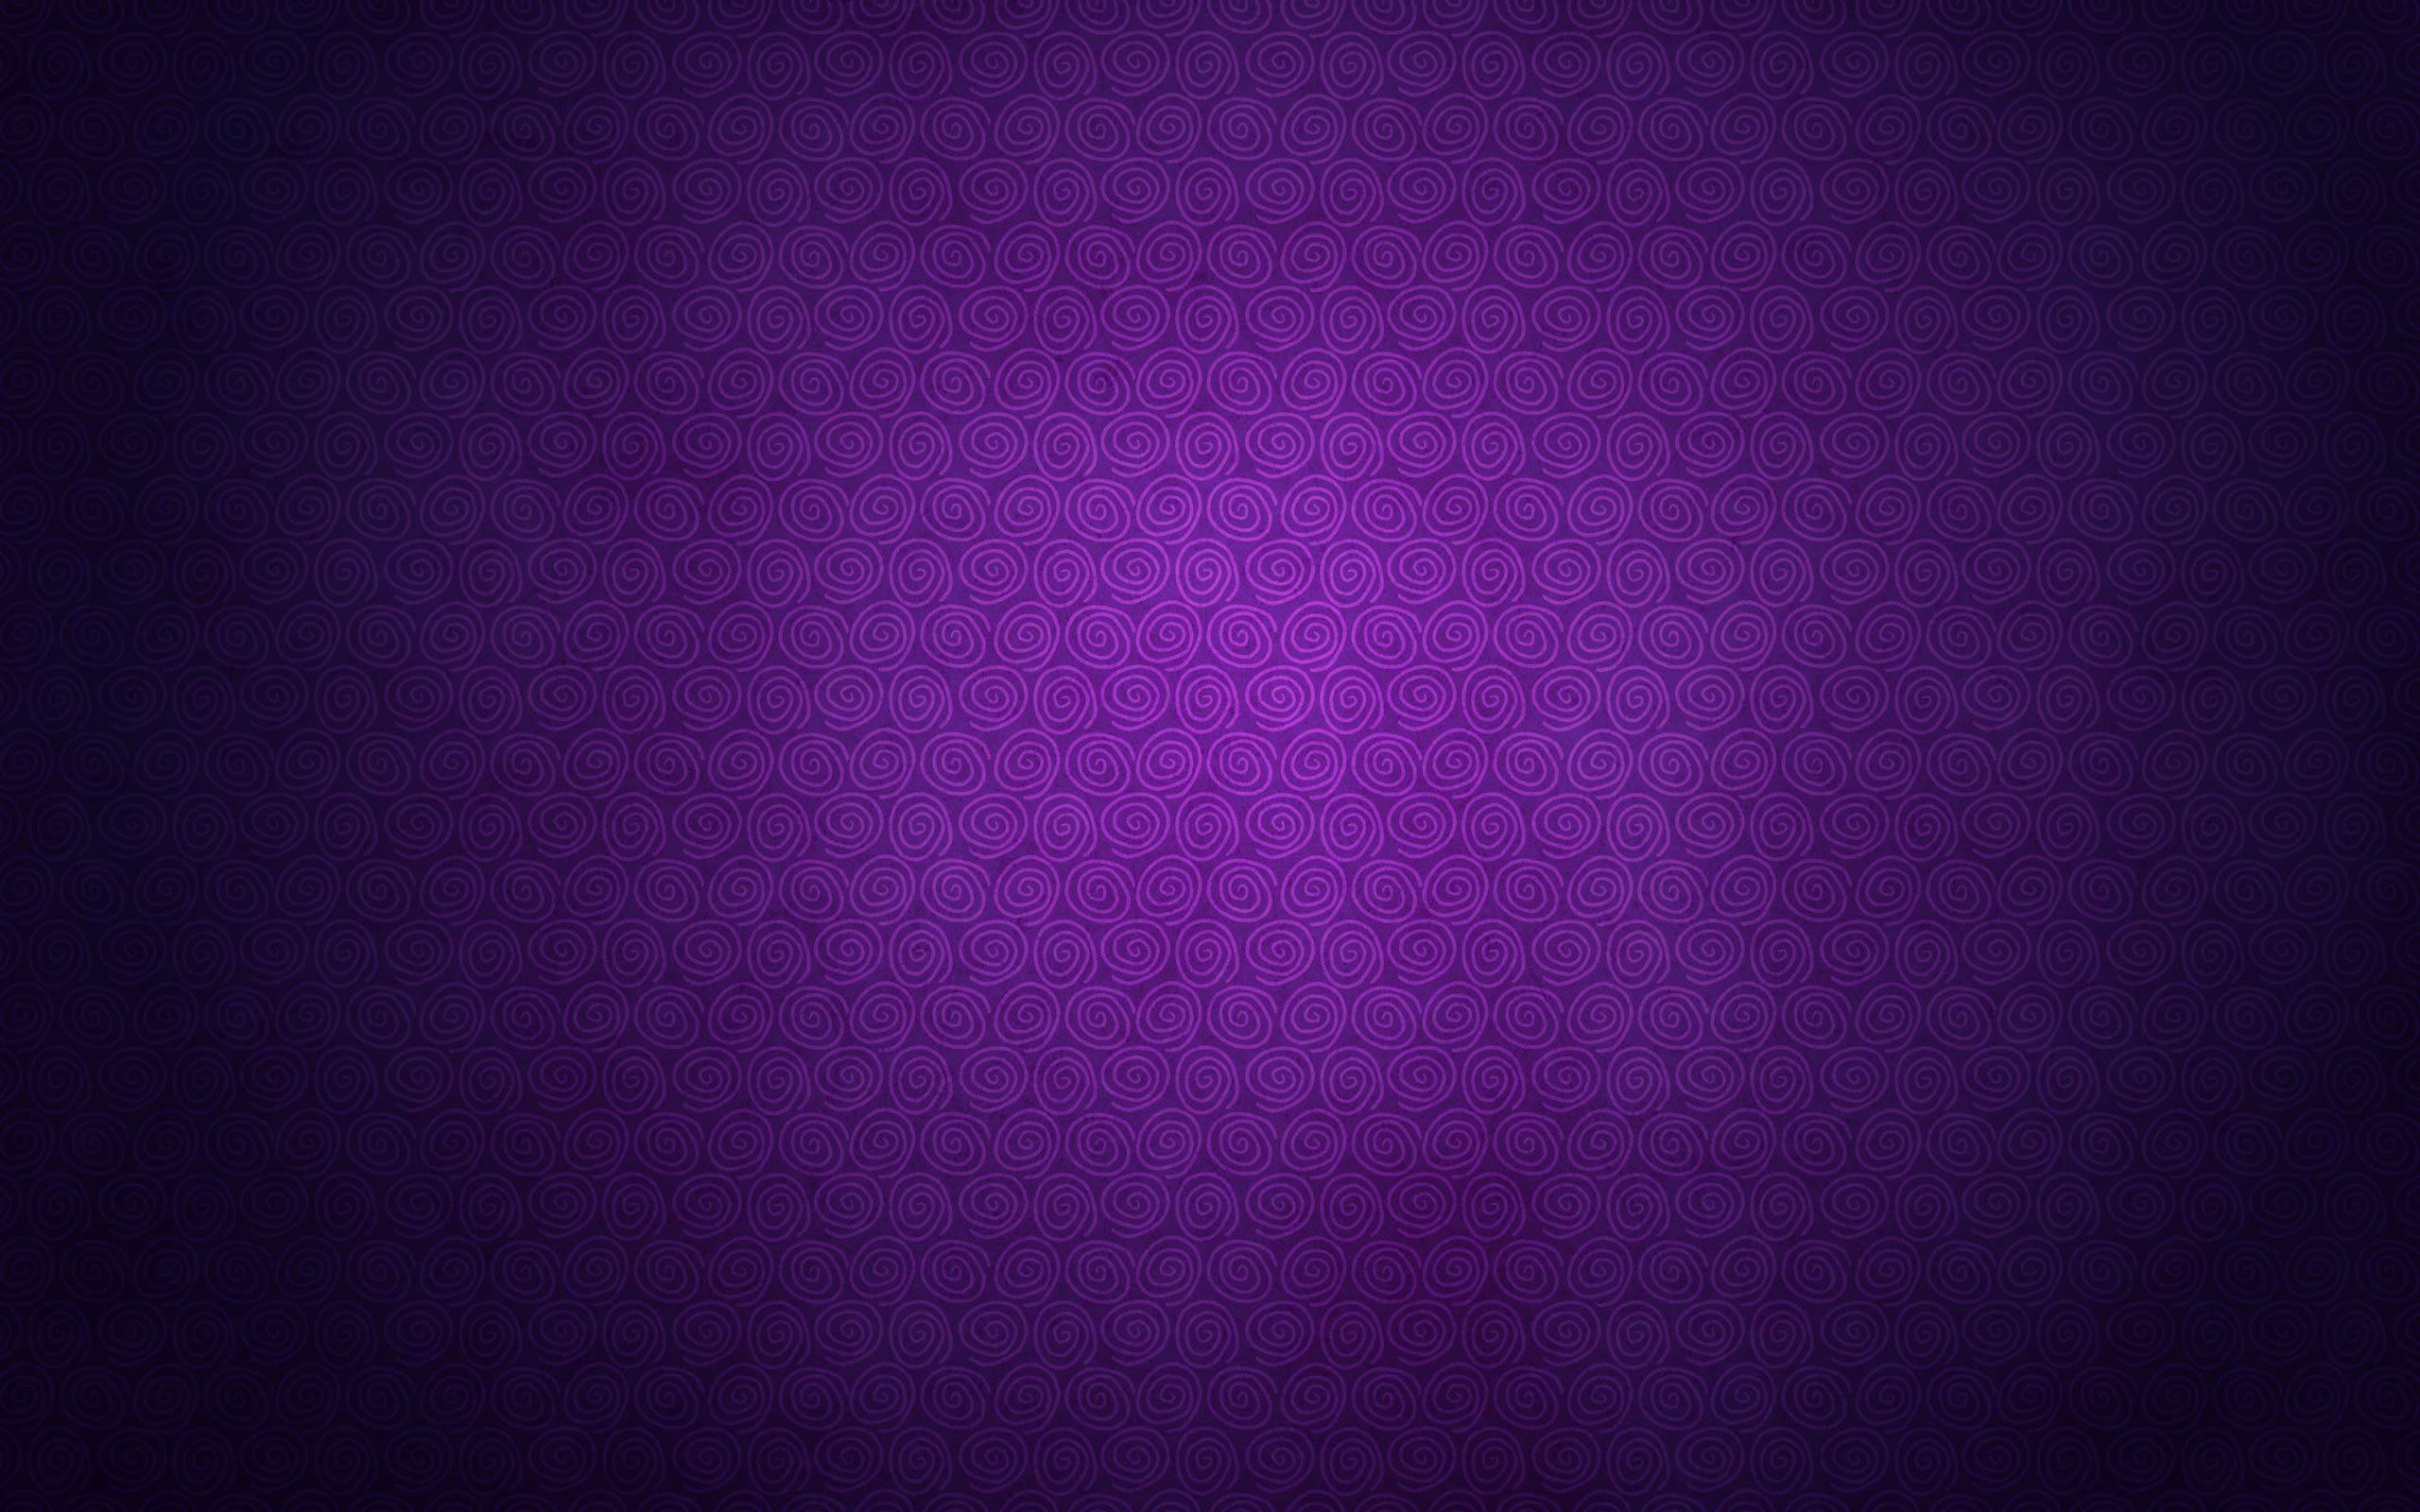 Sunset Wallpapers Free Sunset Desktop Wallpaper Desktop · cool purple …